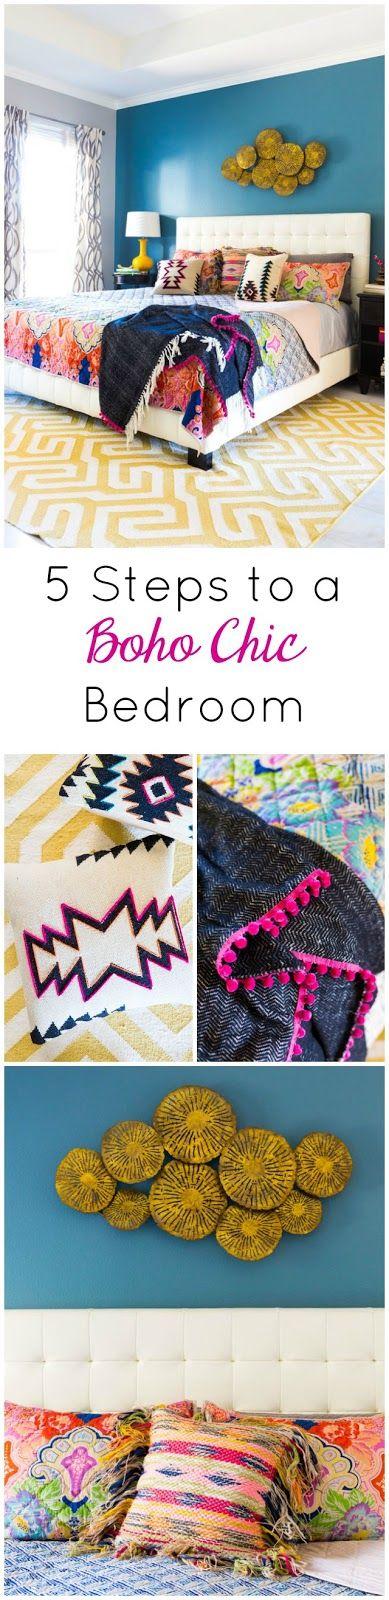 5 Steps to a Colorful Boho Bedroom